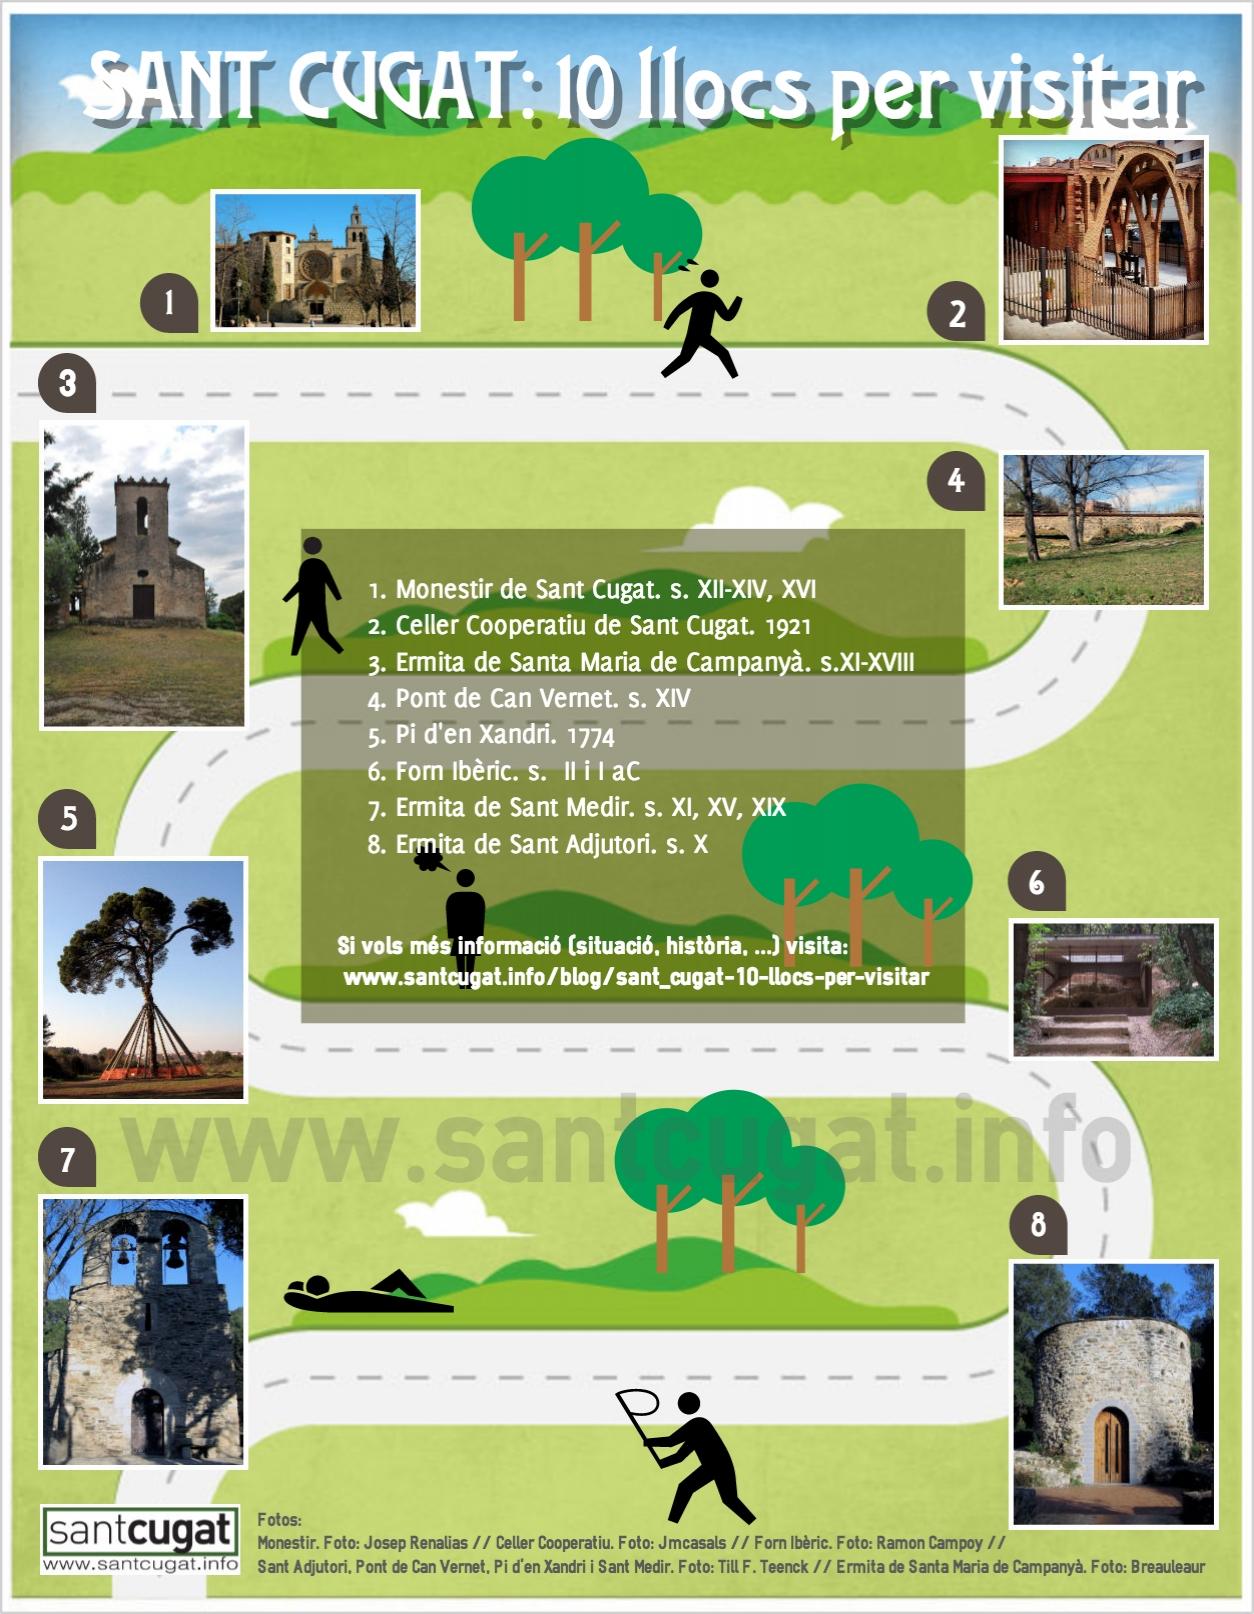 sant_cugat-infografia